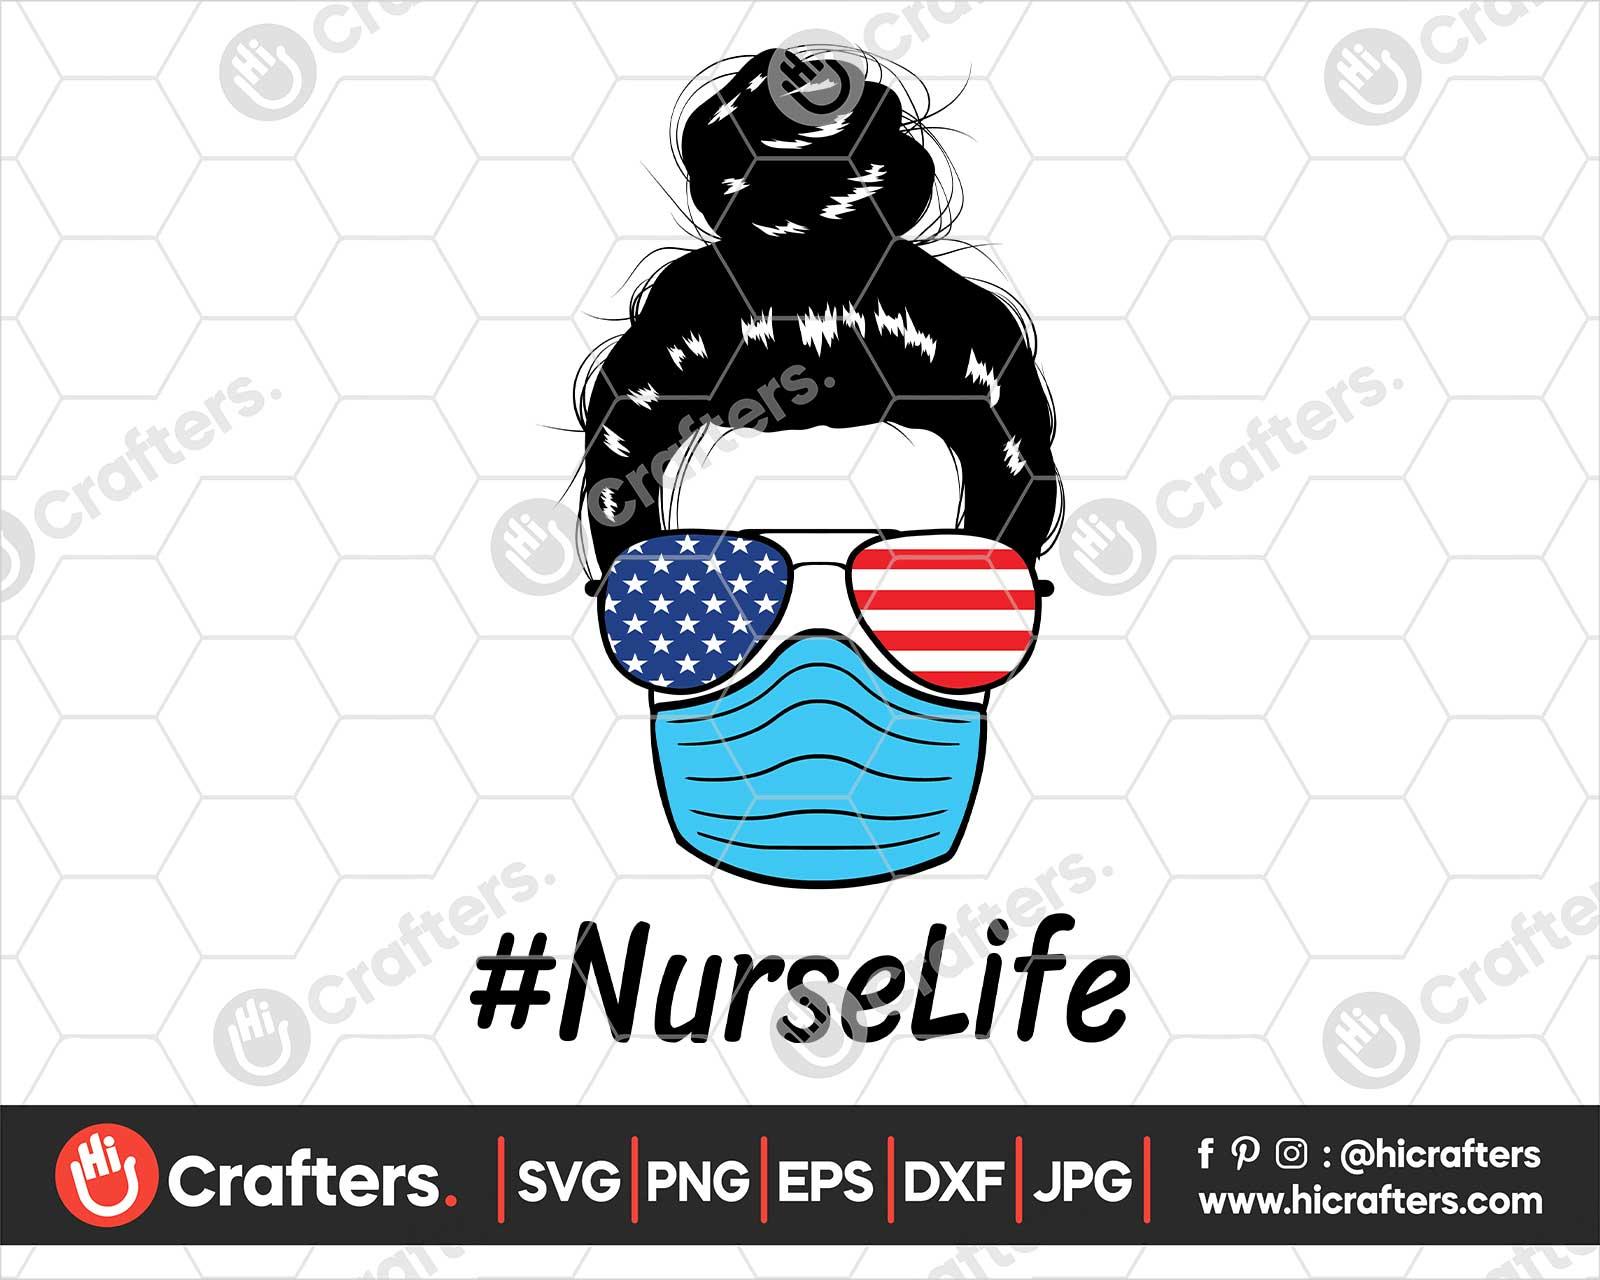 Nurse With Mask Svg Nurse With Flag Svg Png Hi Crafters